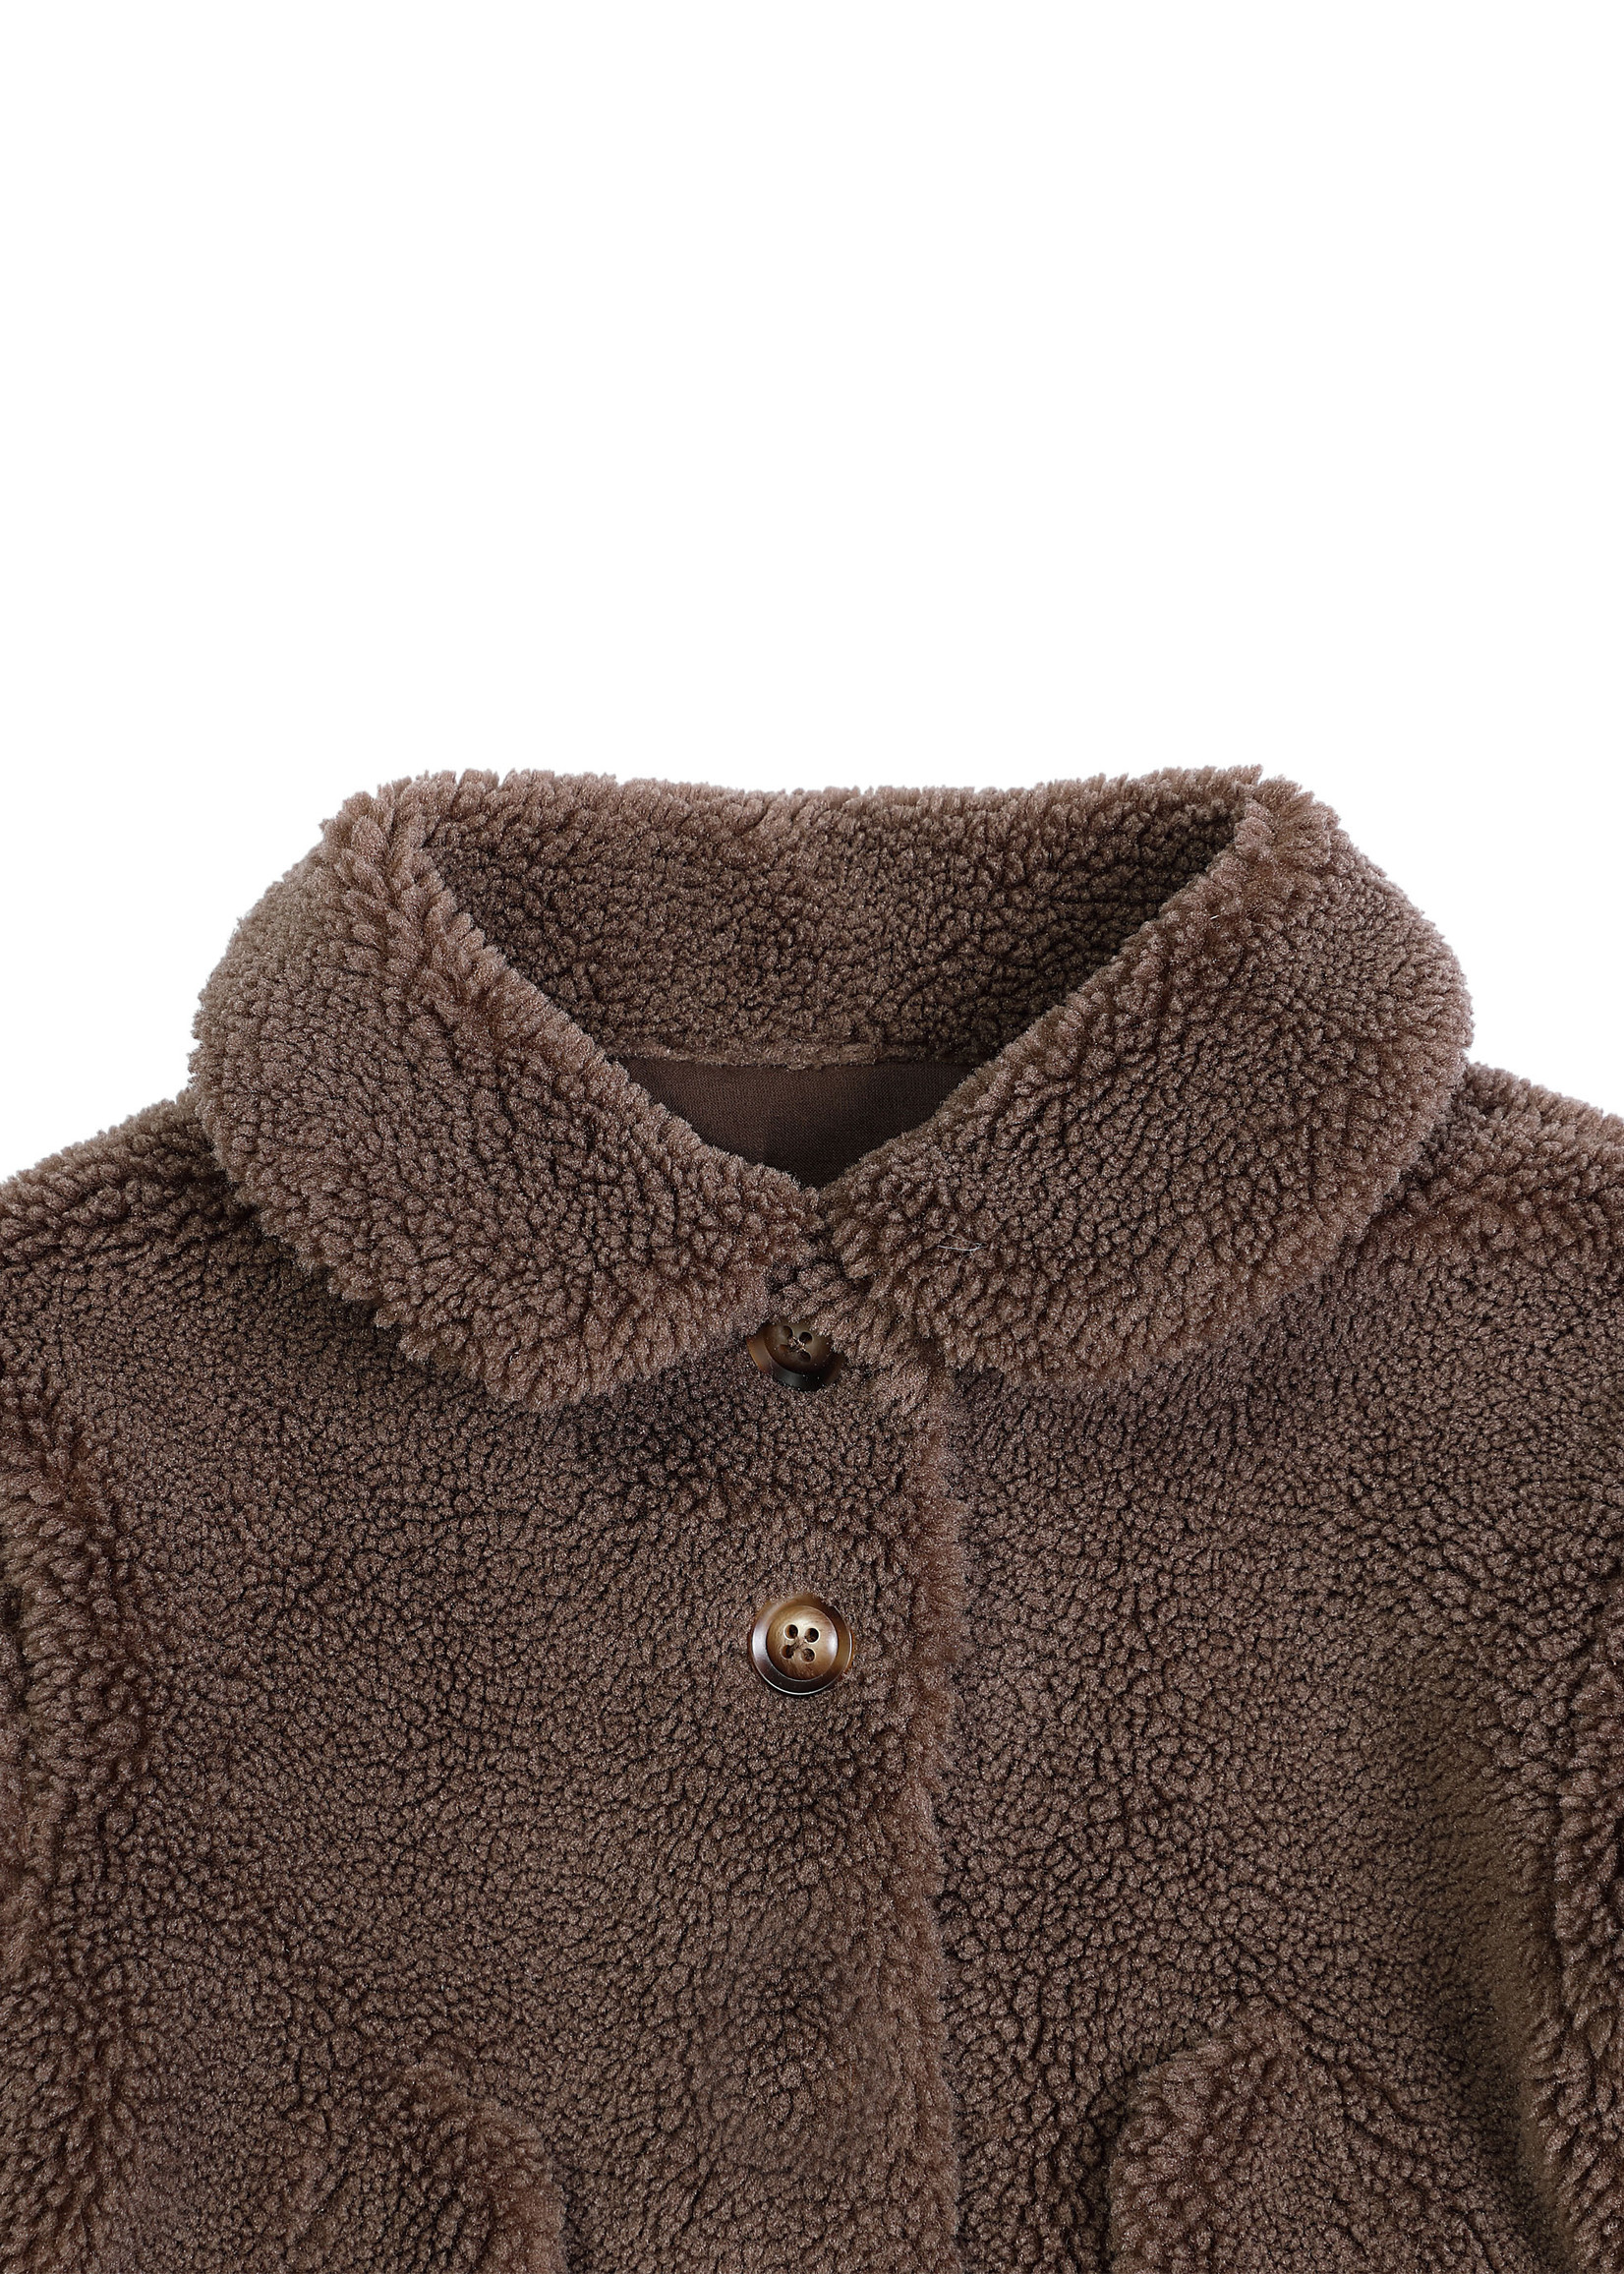 Donsje Amsterdam Bento Jacket - Brown